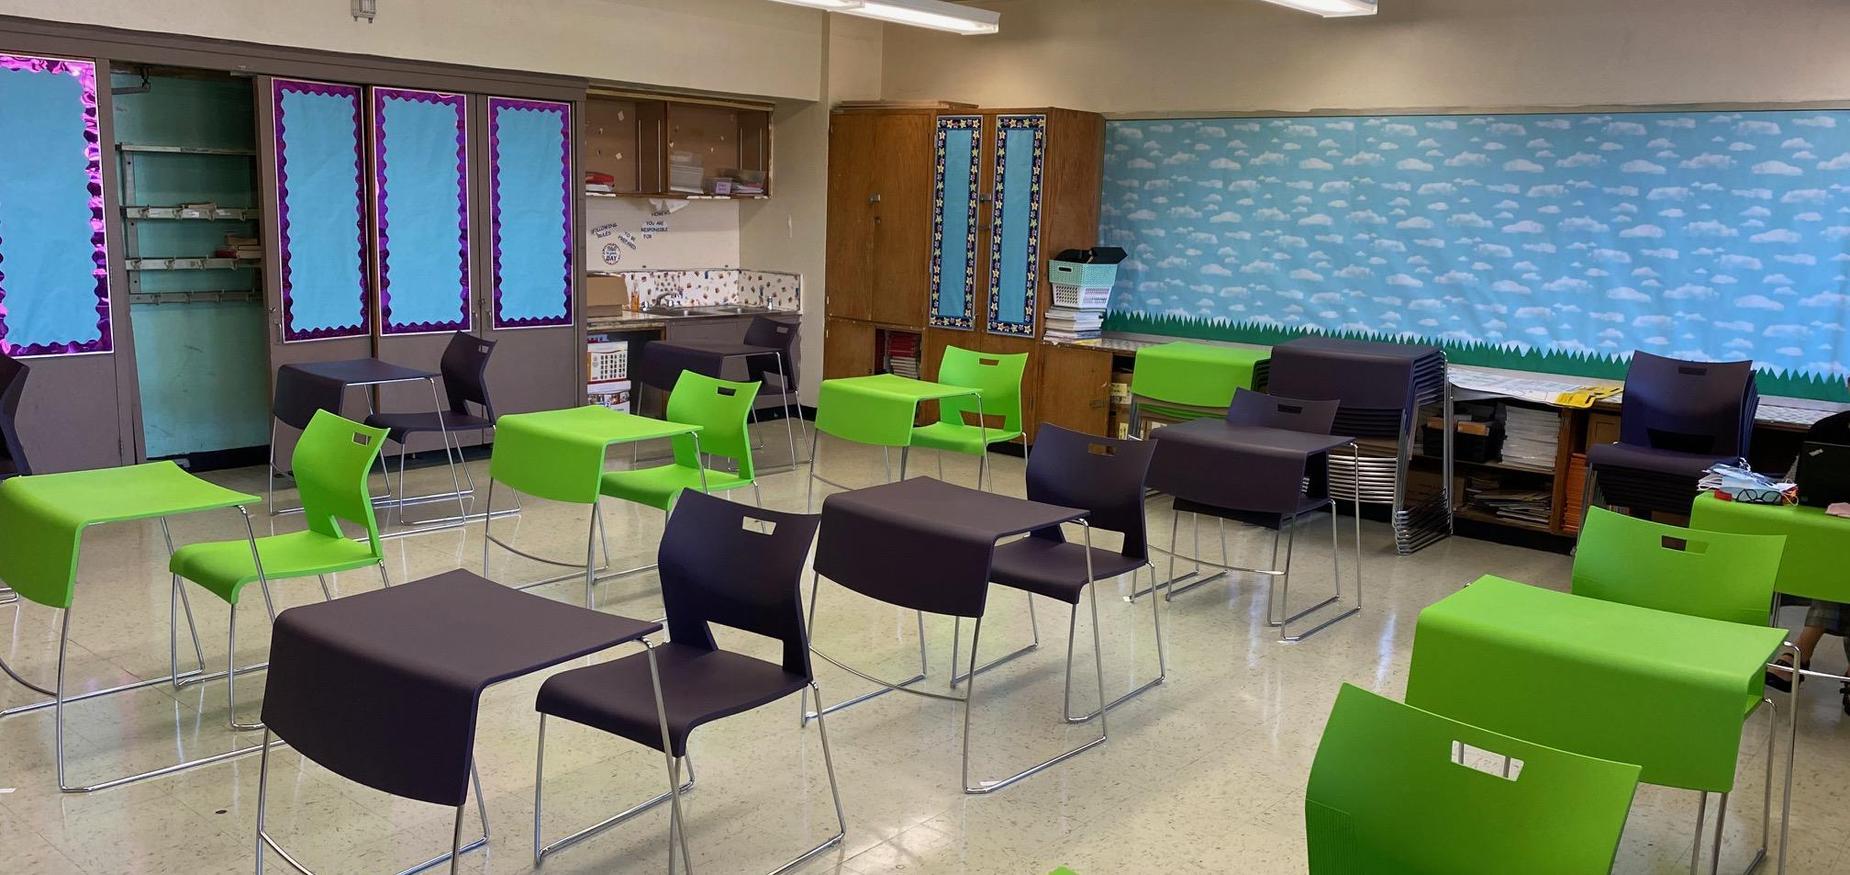 7th grade classroom